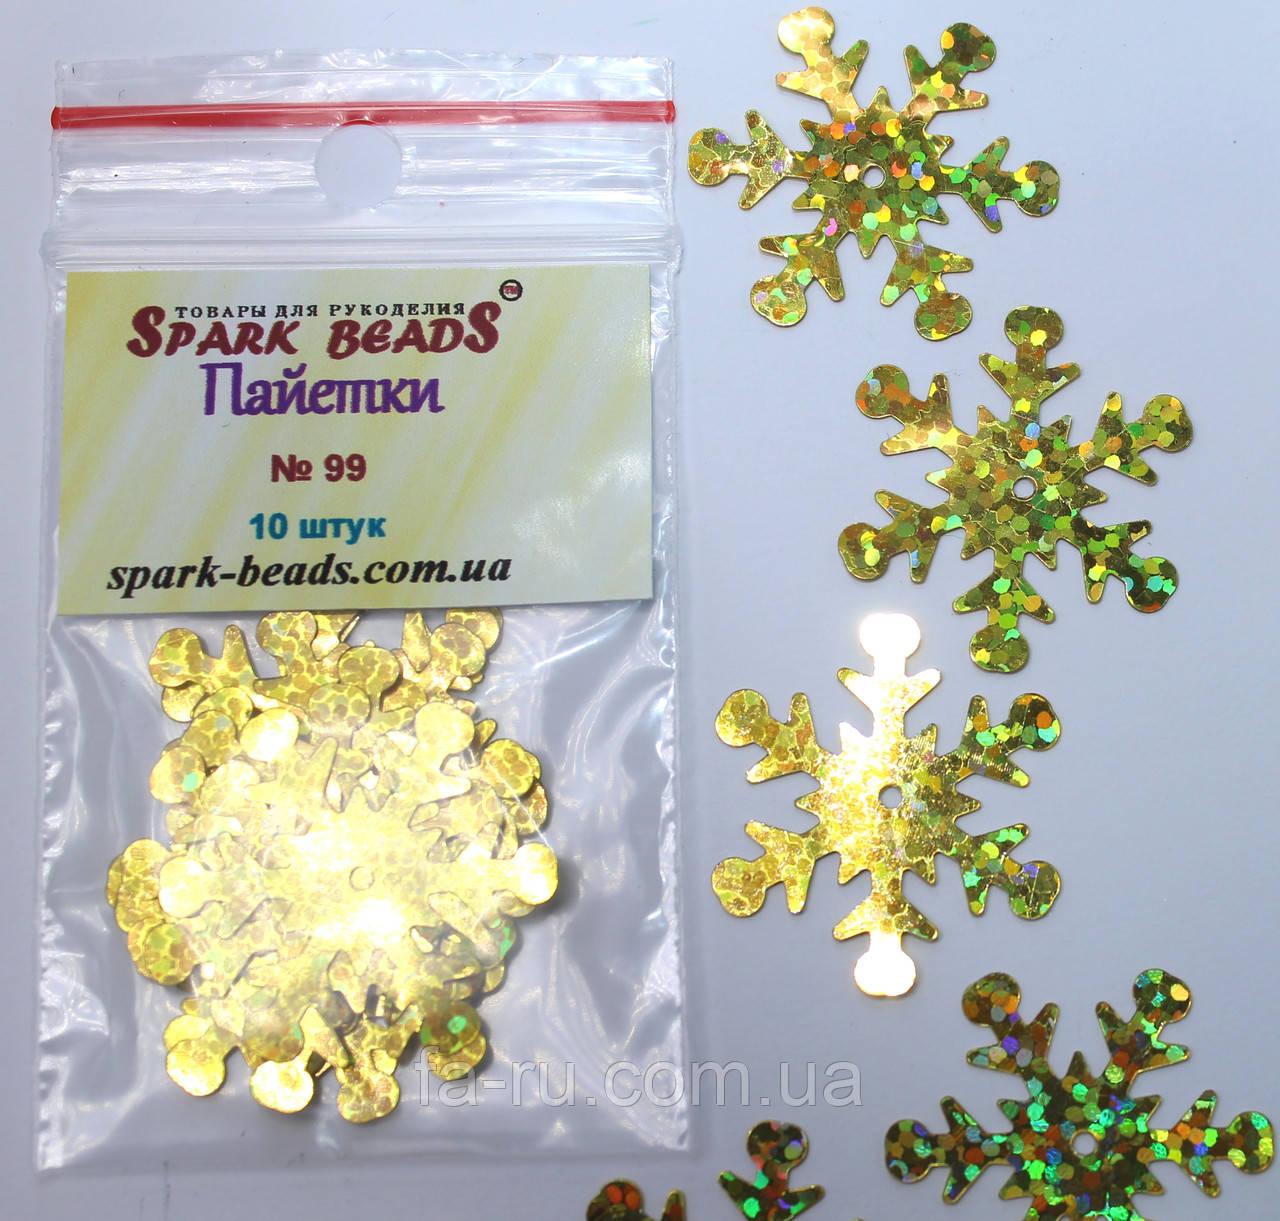 Пайетки снежинка золото, Ø - 25мм (10шт/уп). №99